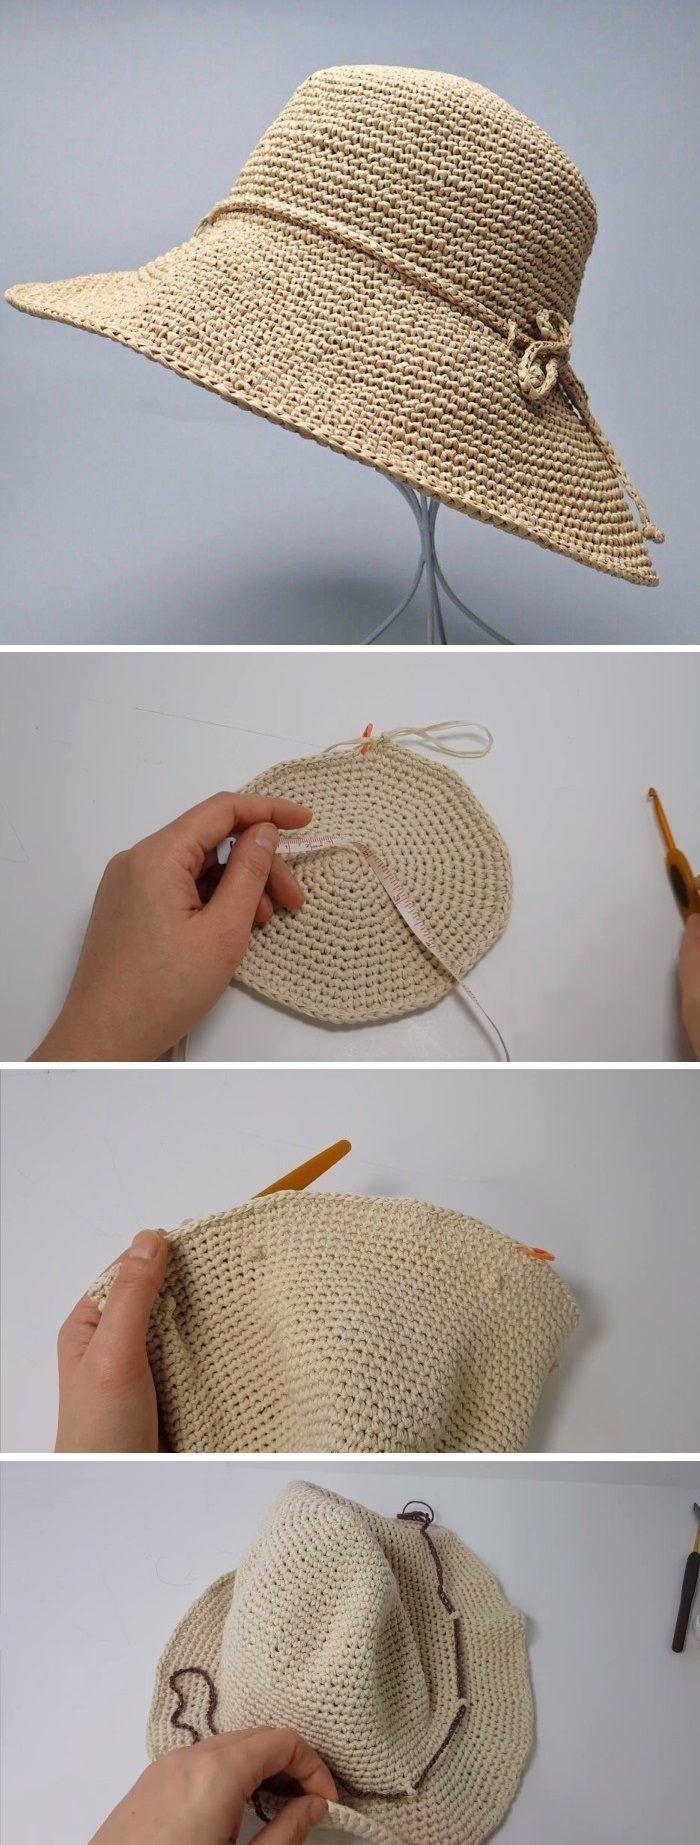 Crochet Summer Hat Tutorial #crochethatpatterns